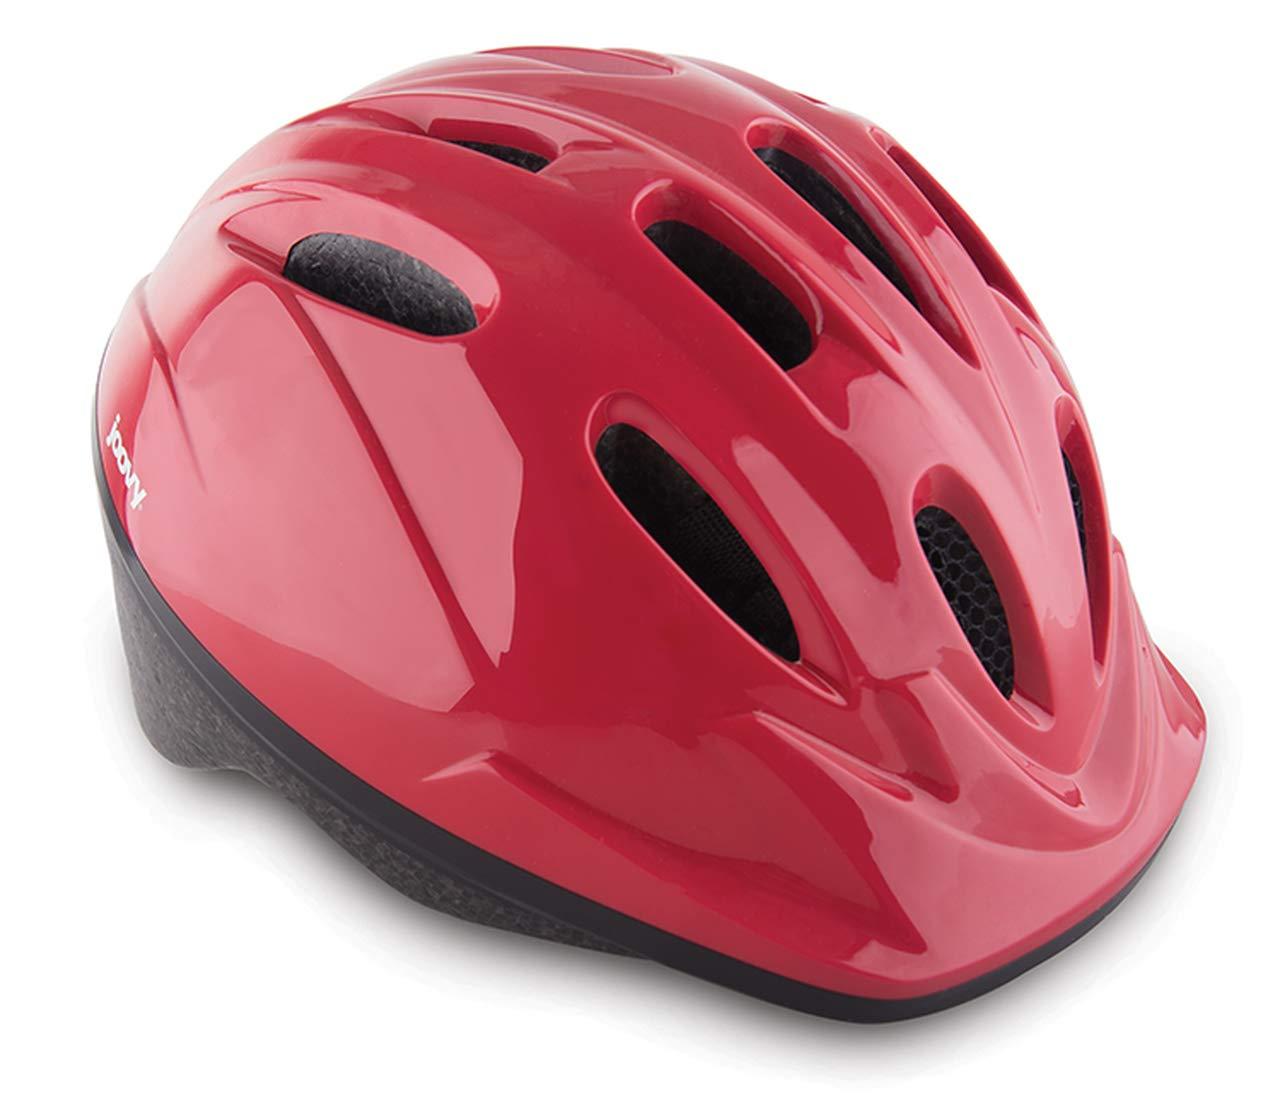 Joovy Noodle Kids Helmet